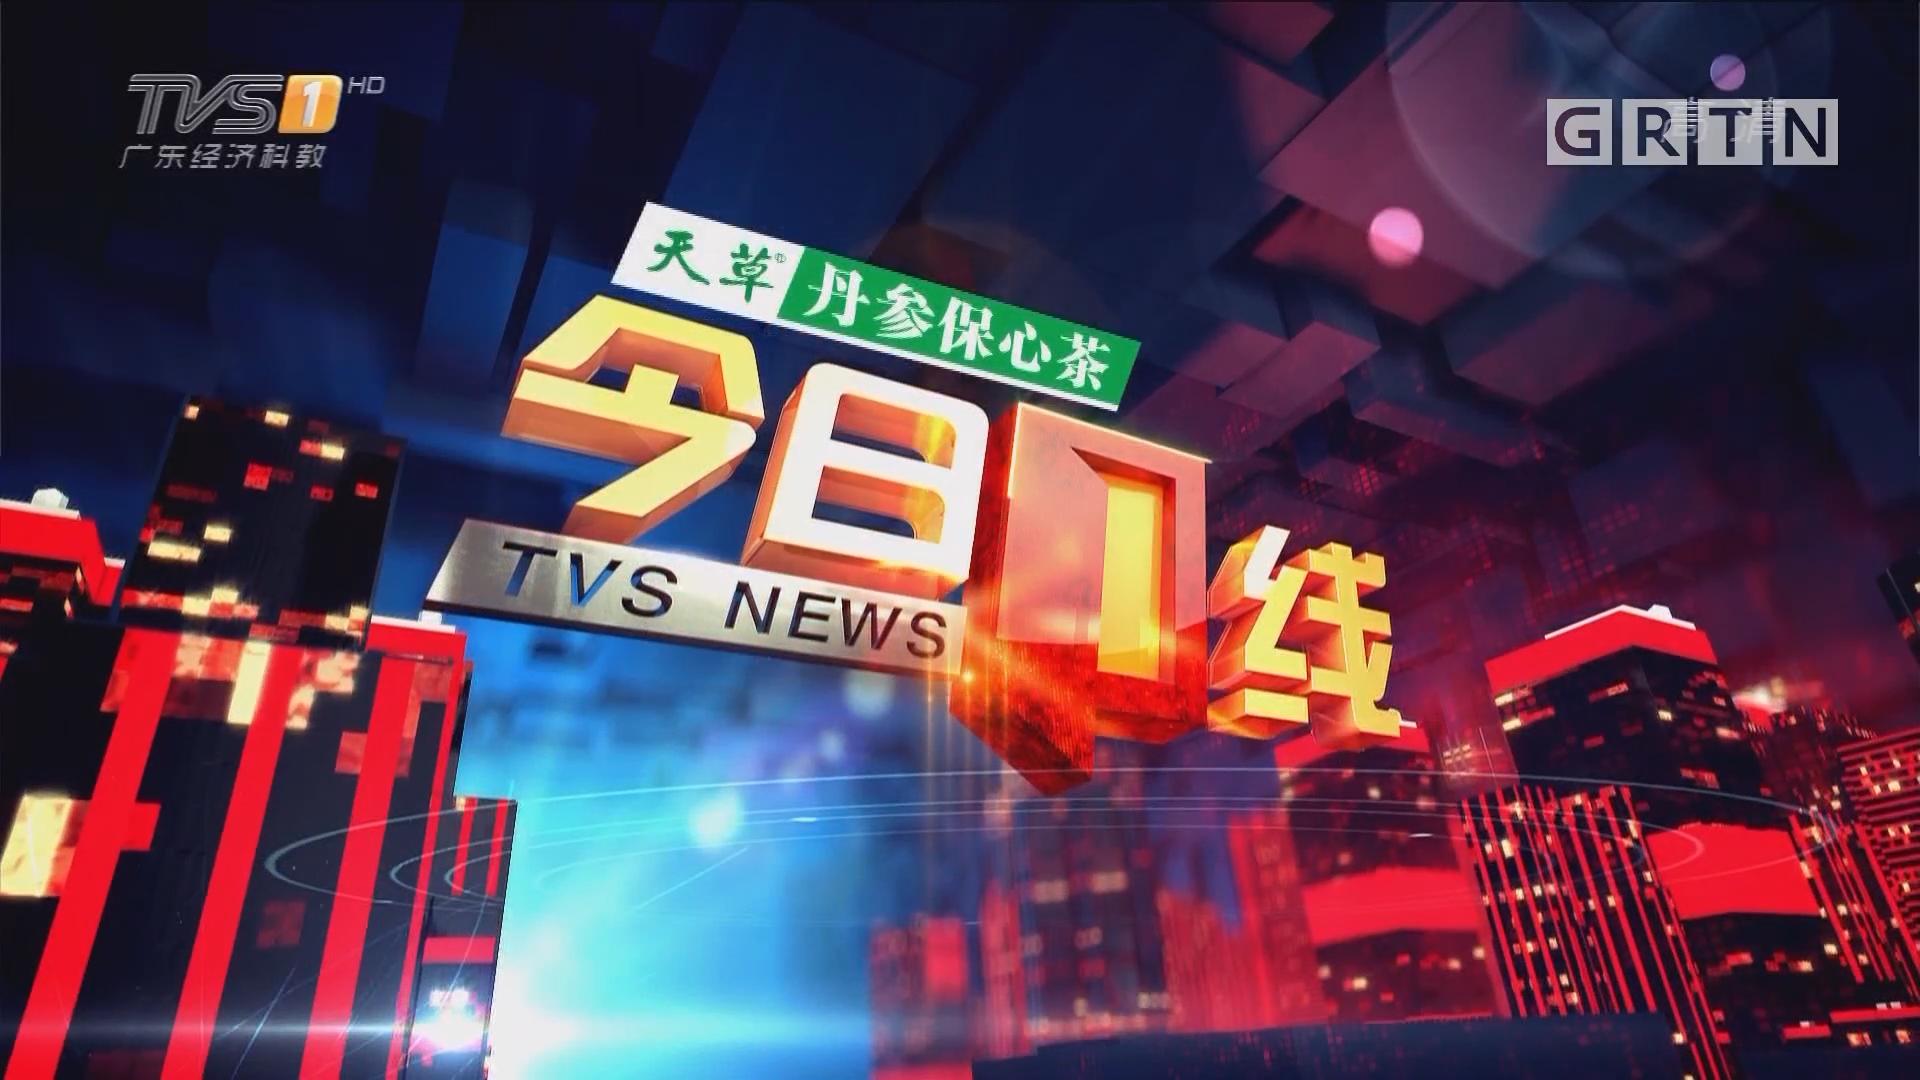 [HD][2018-11-27]今日一线:广州灯光秀:今明两晚广州塔灯光秀取消!周三预约入场